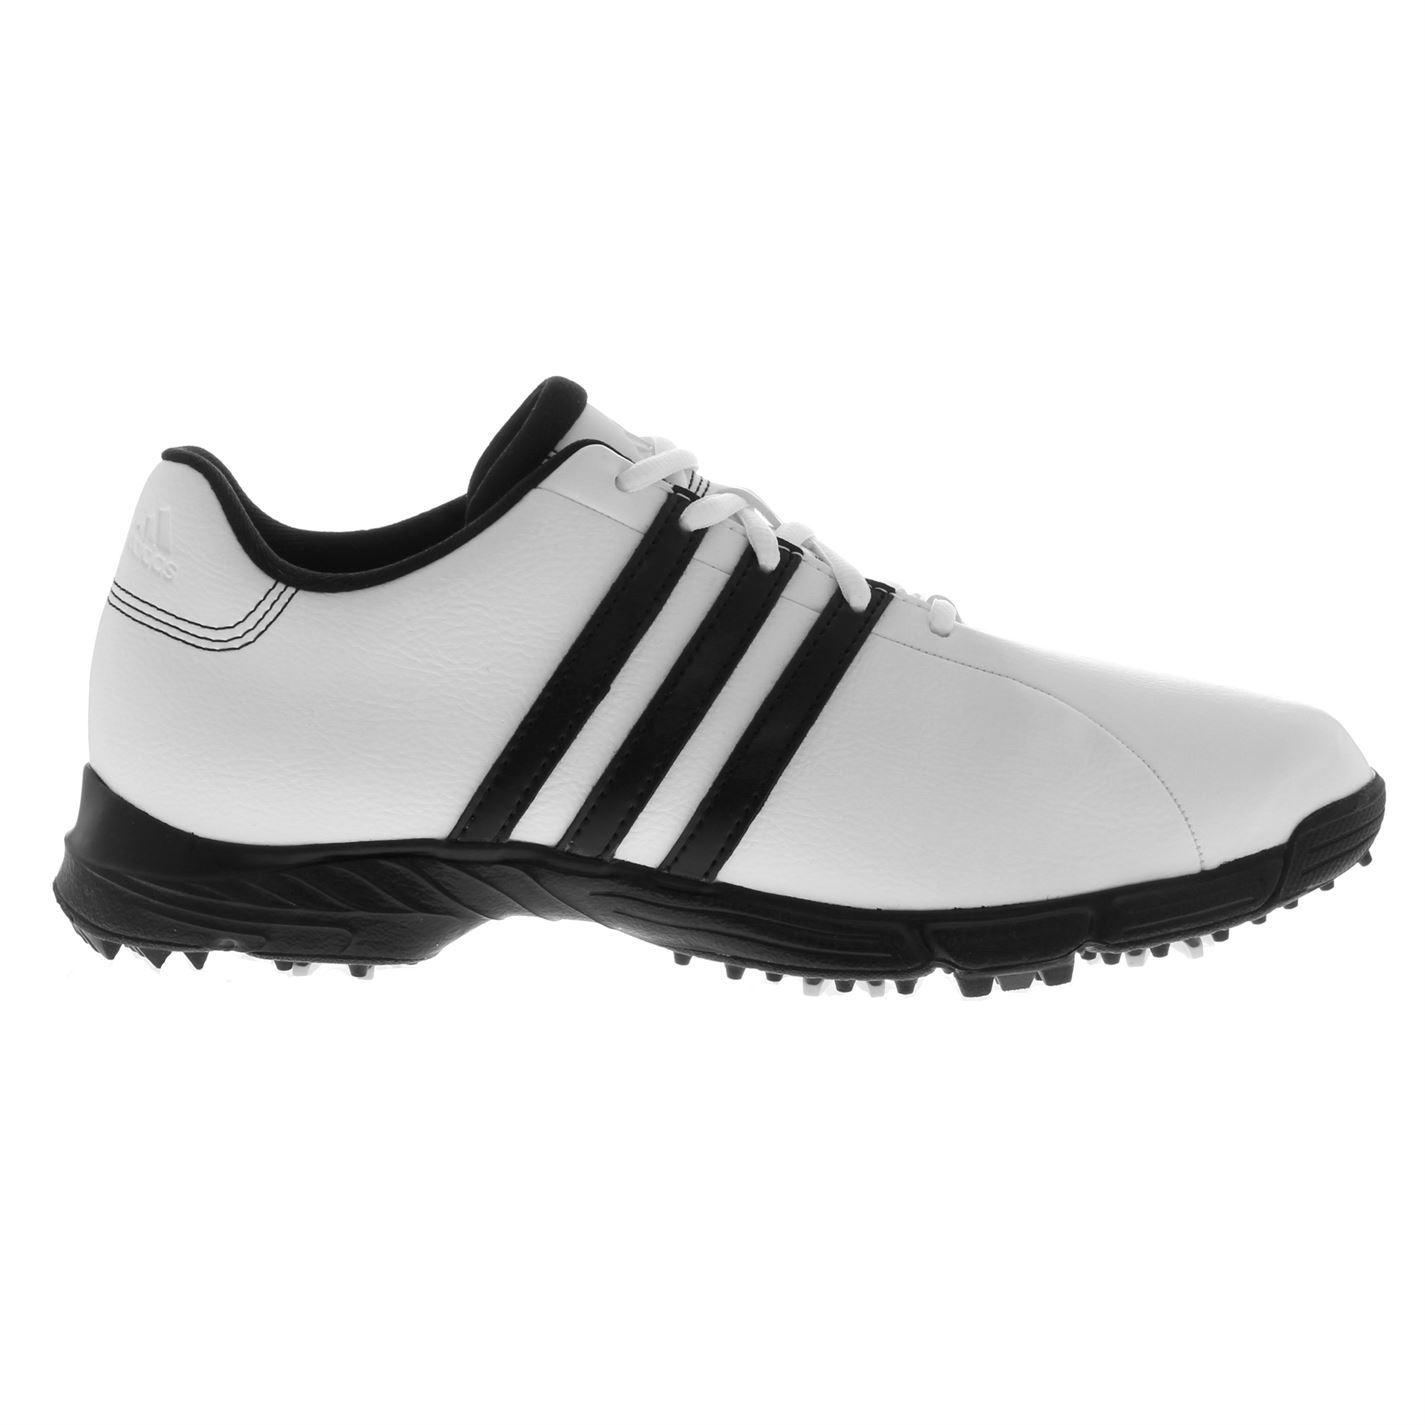 adidas-Golflite-Golf-Shoes-Mens-Spikes-Footwear thumbnail 19